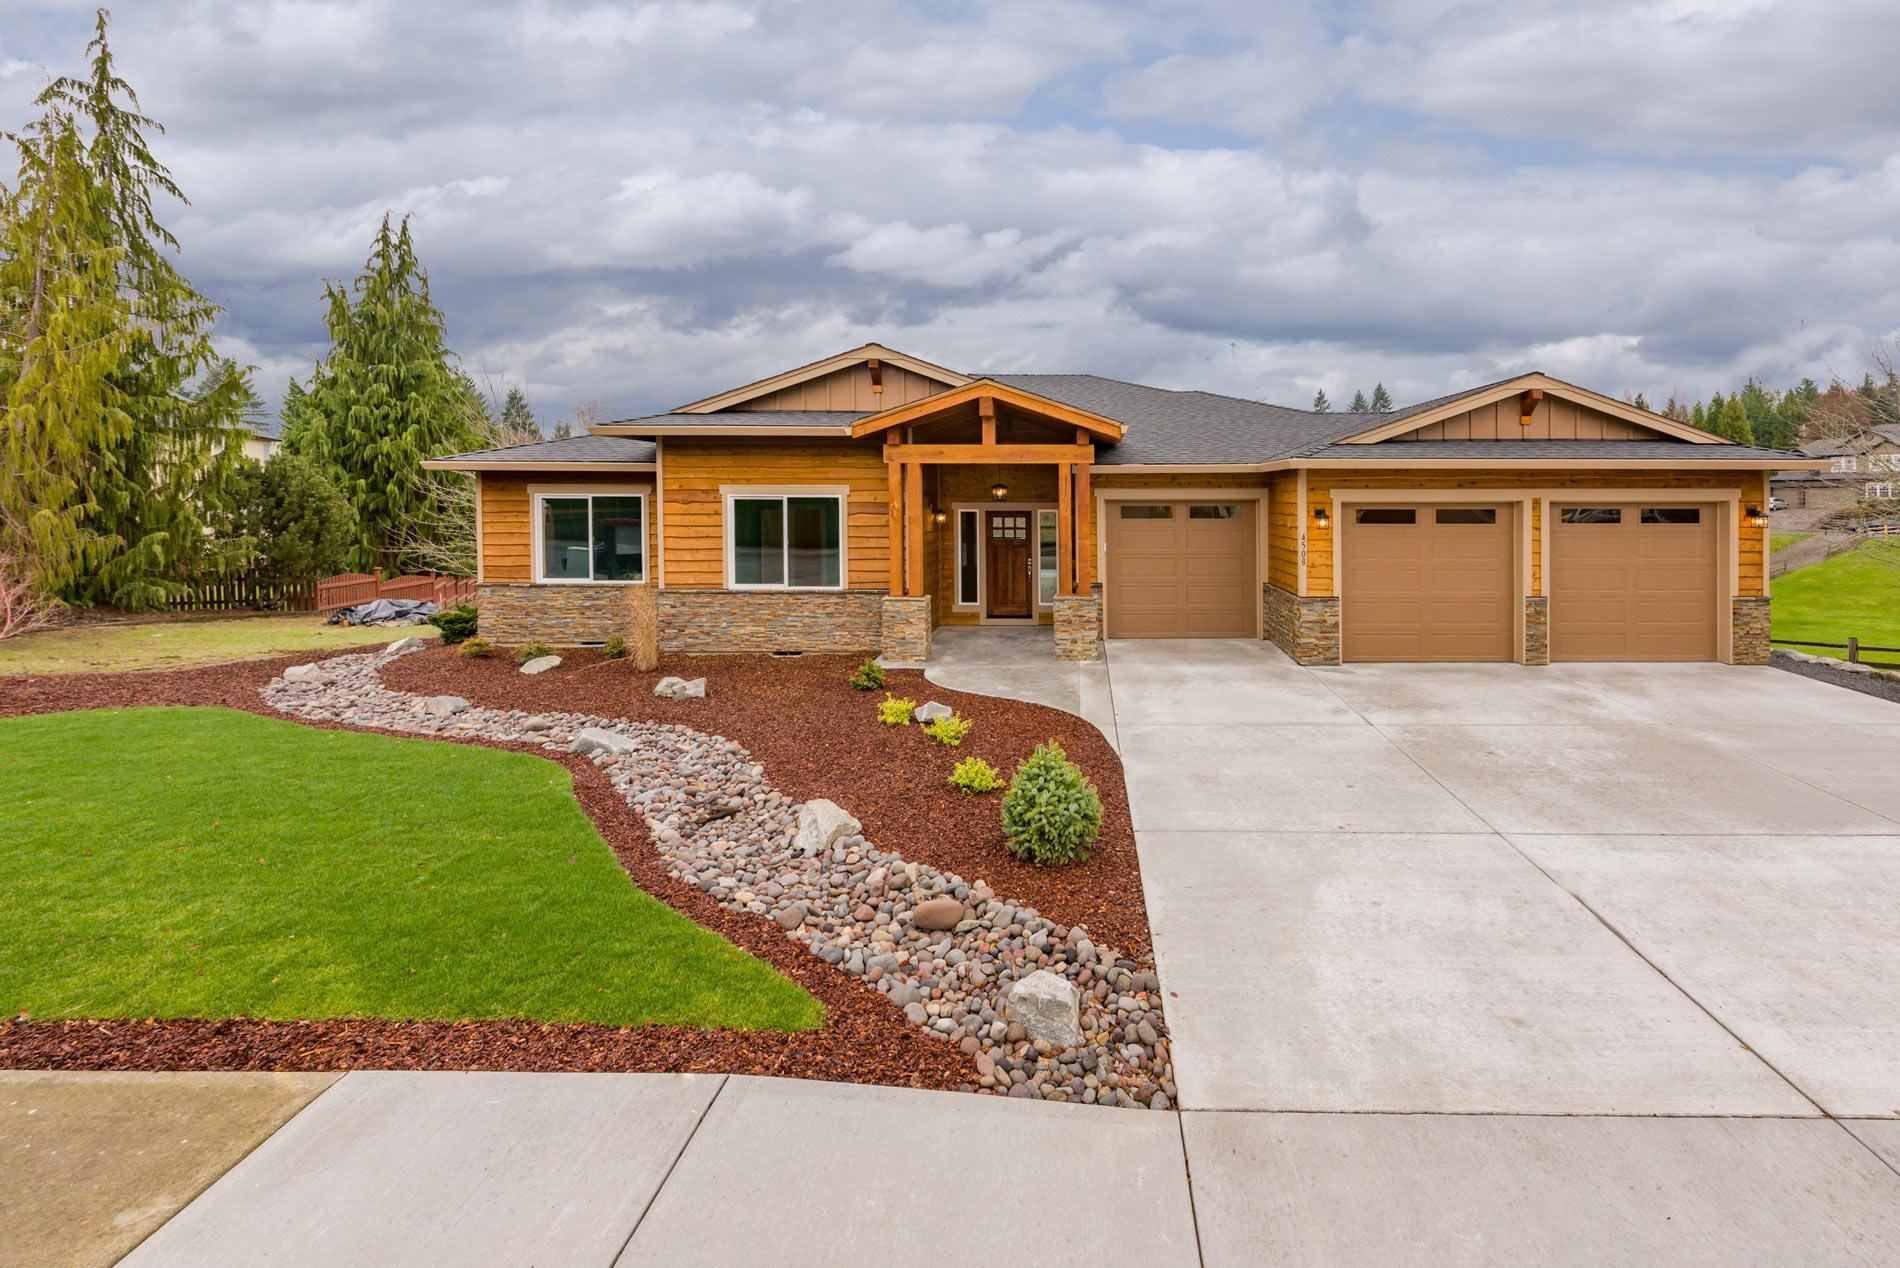 Custom Home Builders Vancouver WA: Evergreen Homes